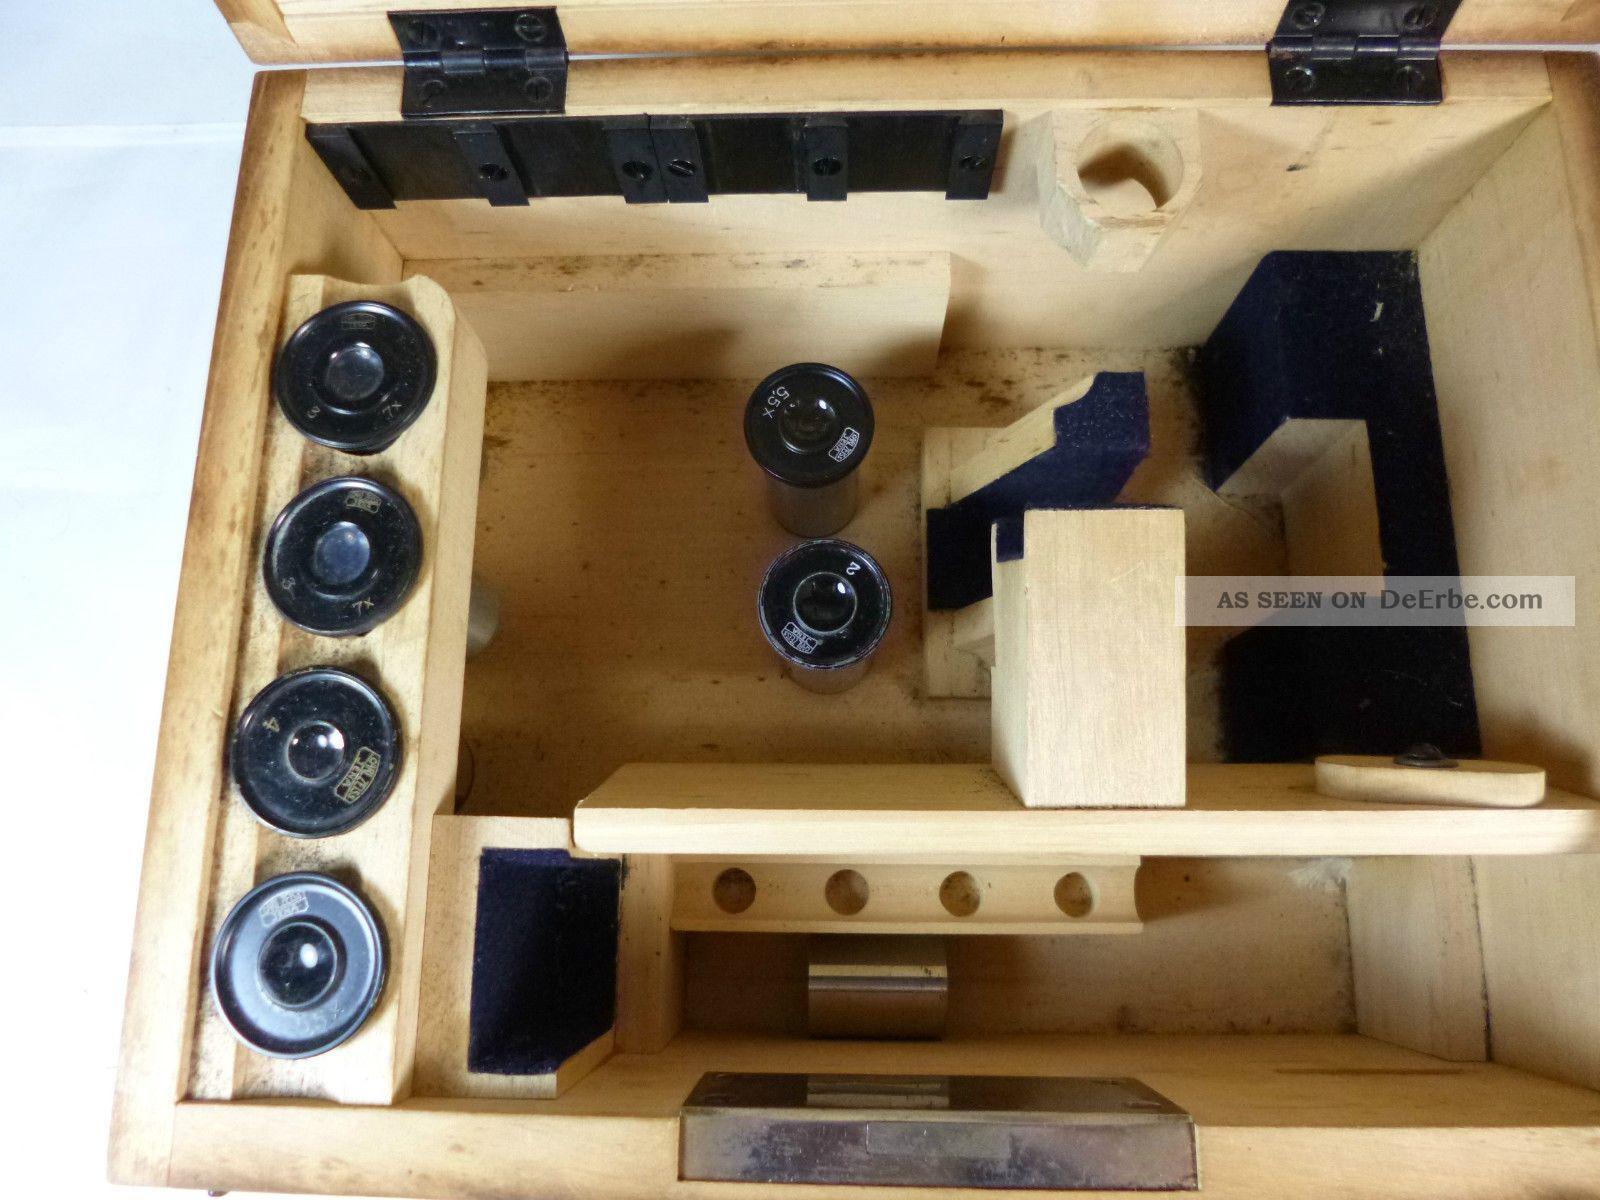 Altes hornhaut mikroskop carl zeiss jena im originalen holzkasten